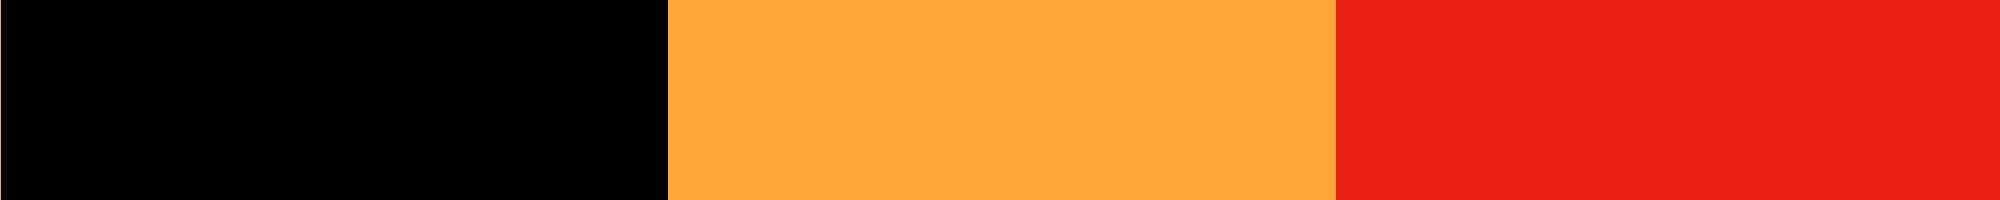 driekleur